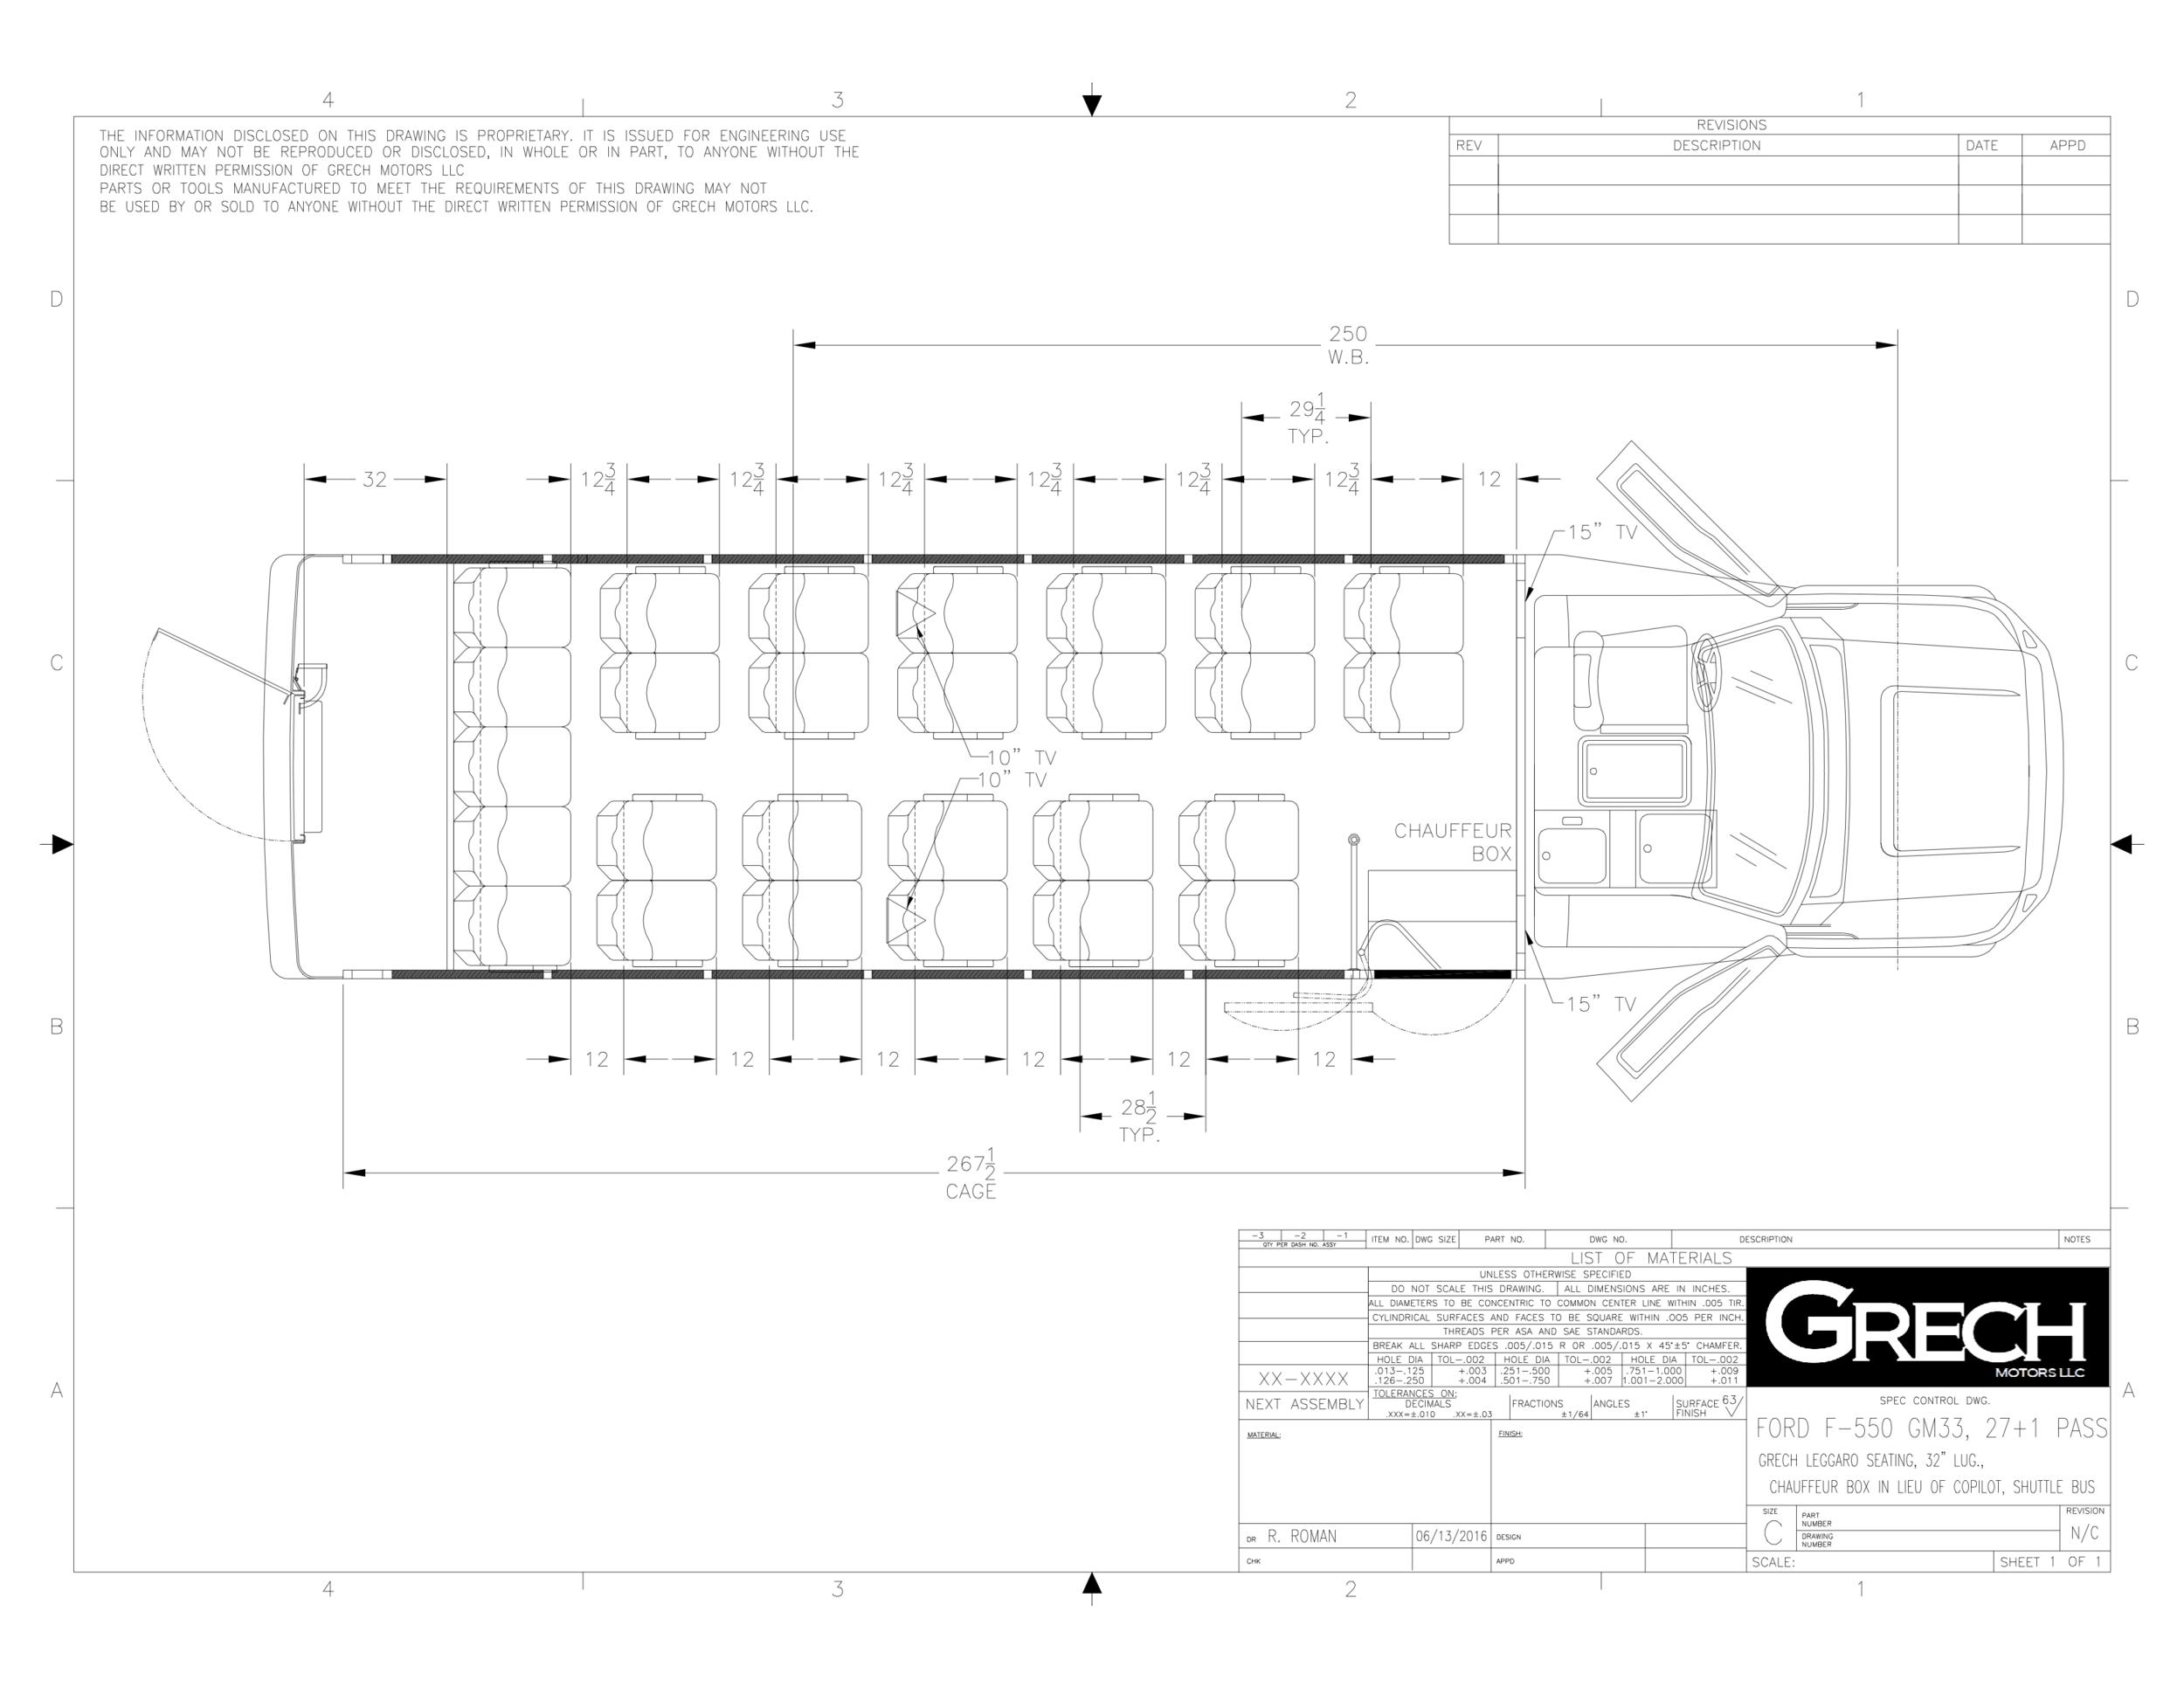 F-550 GM33 27+1, Grech Leggero Seating, 32in Lug, Chauffeur Box In Lieu Of Copilot